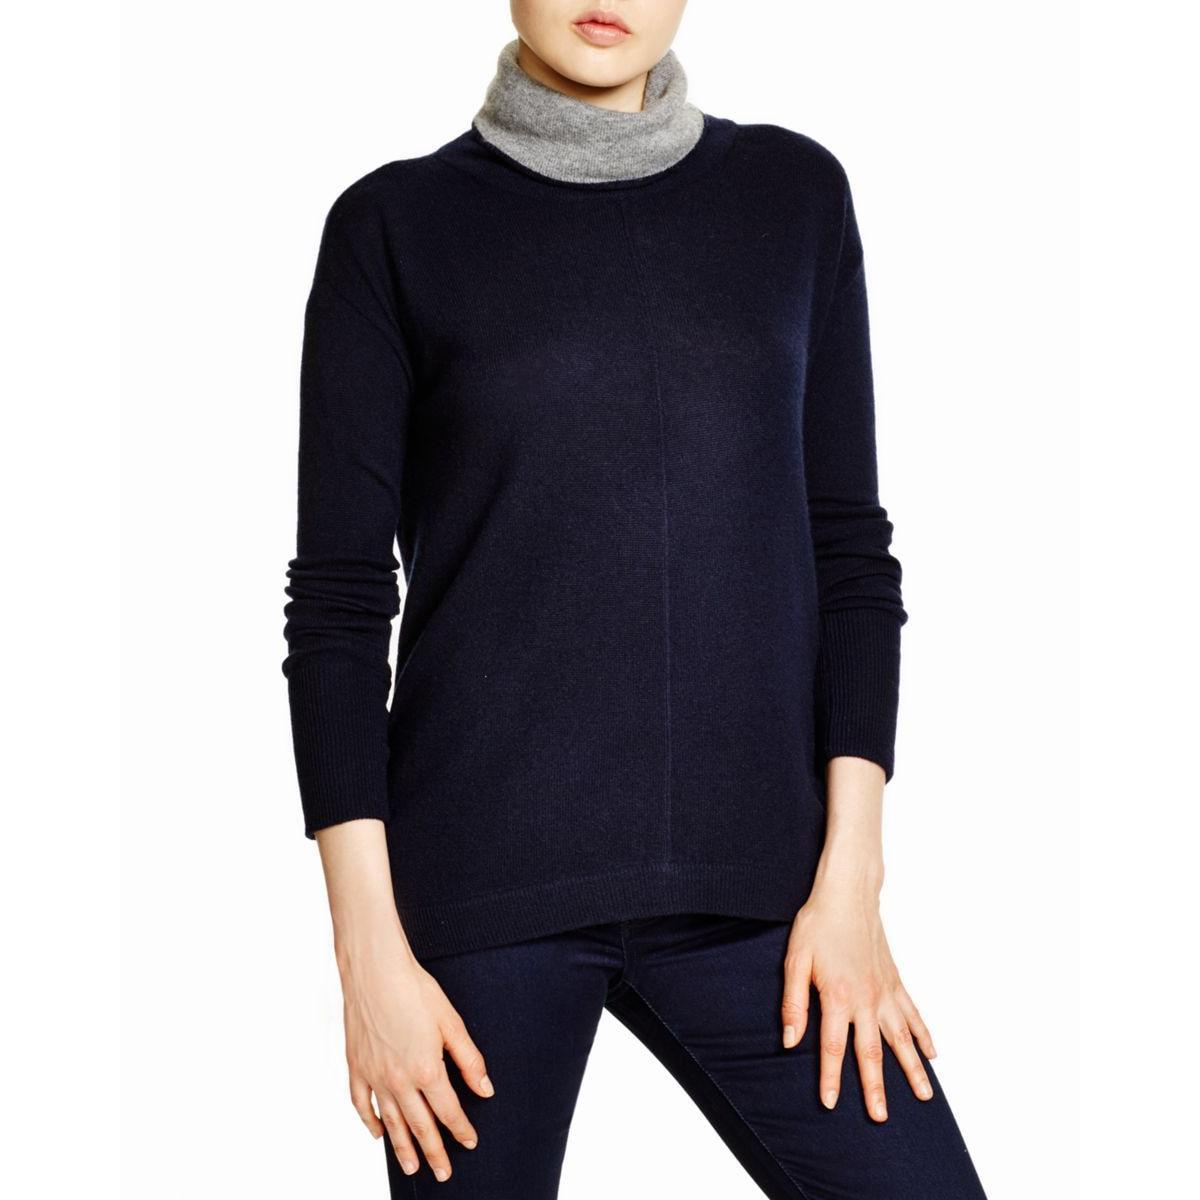 Magaschoni Womens Cashmere Colorblock Turtleneck Sweater